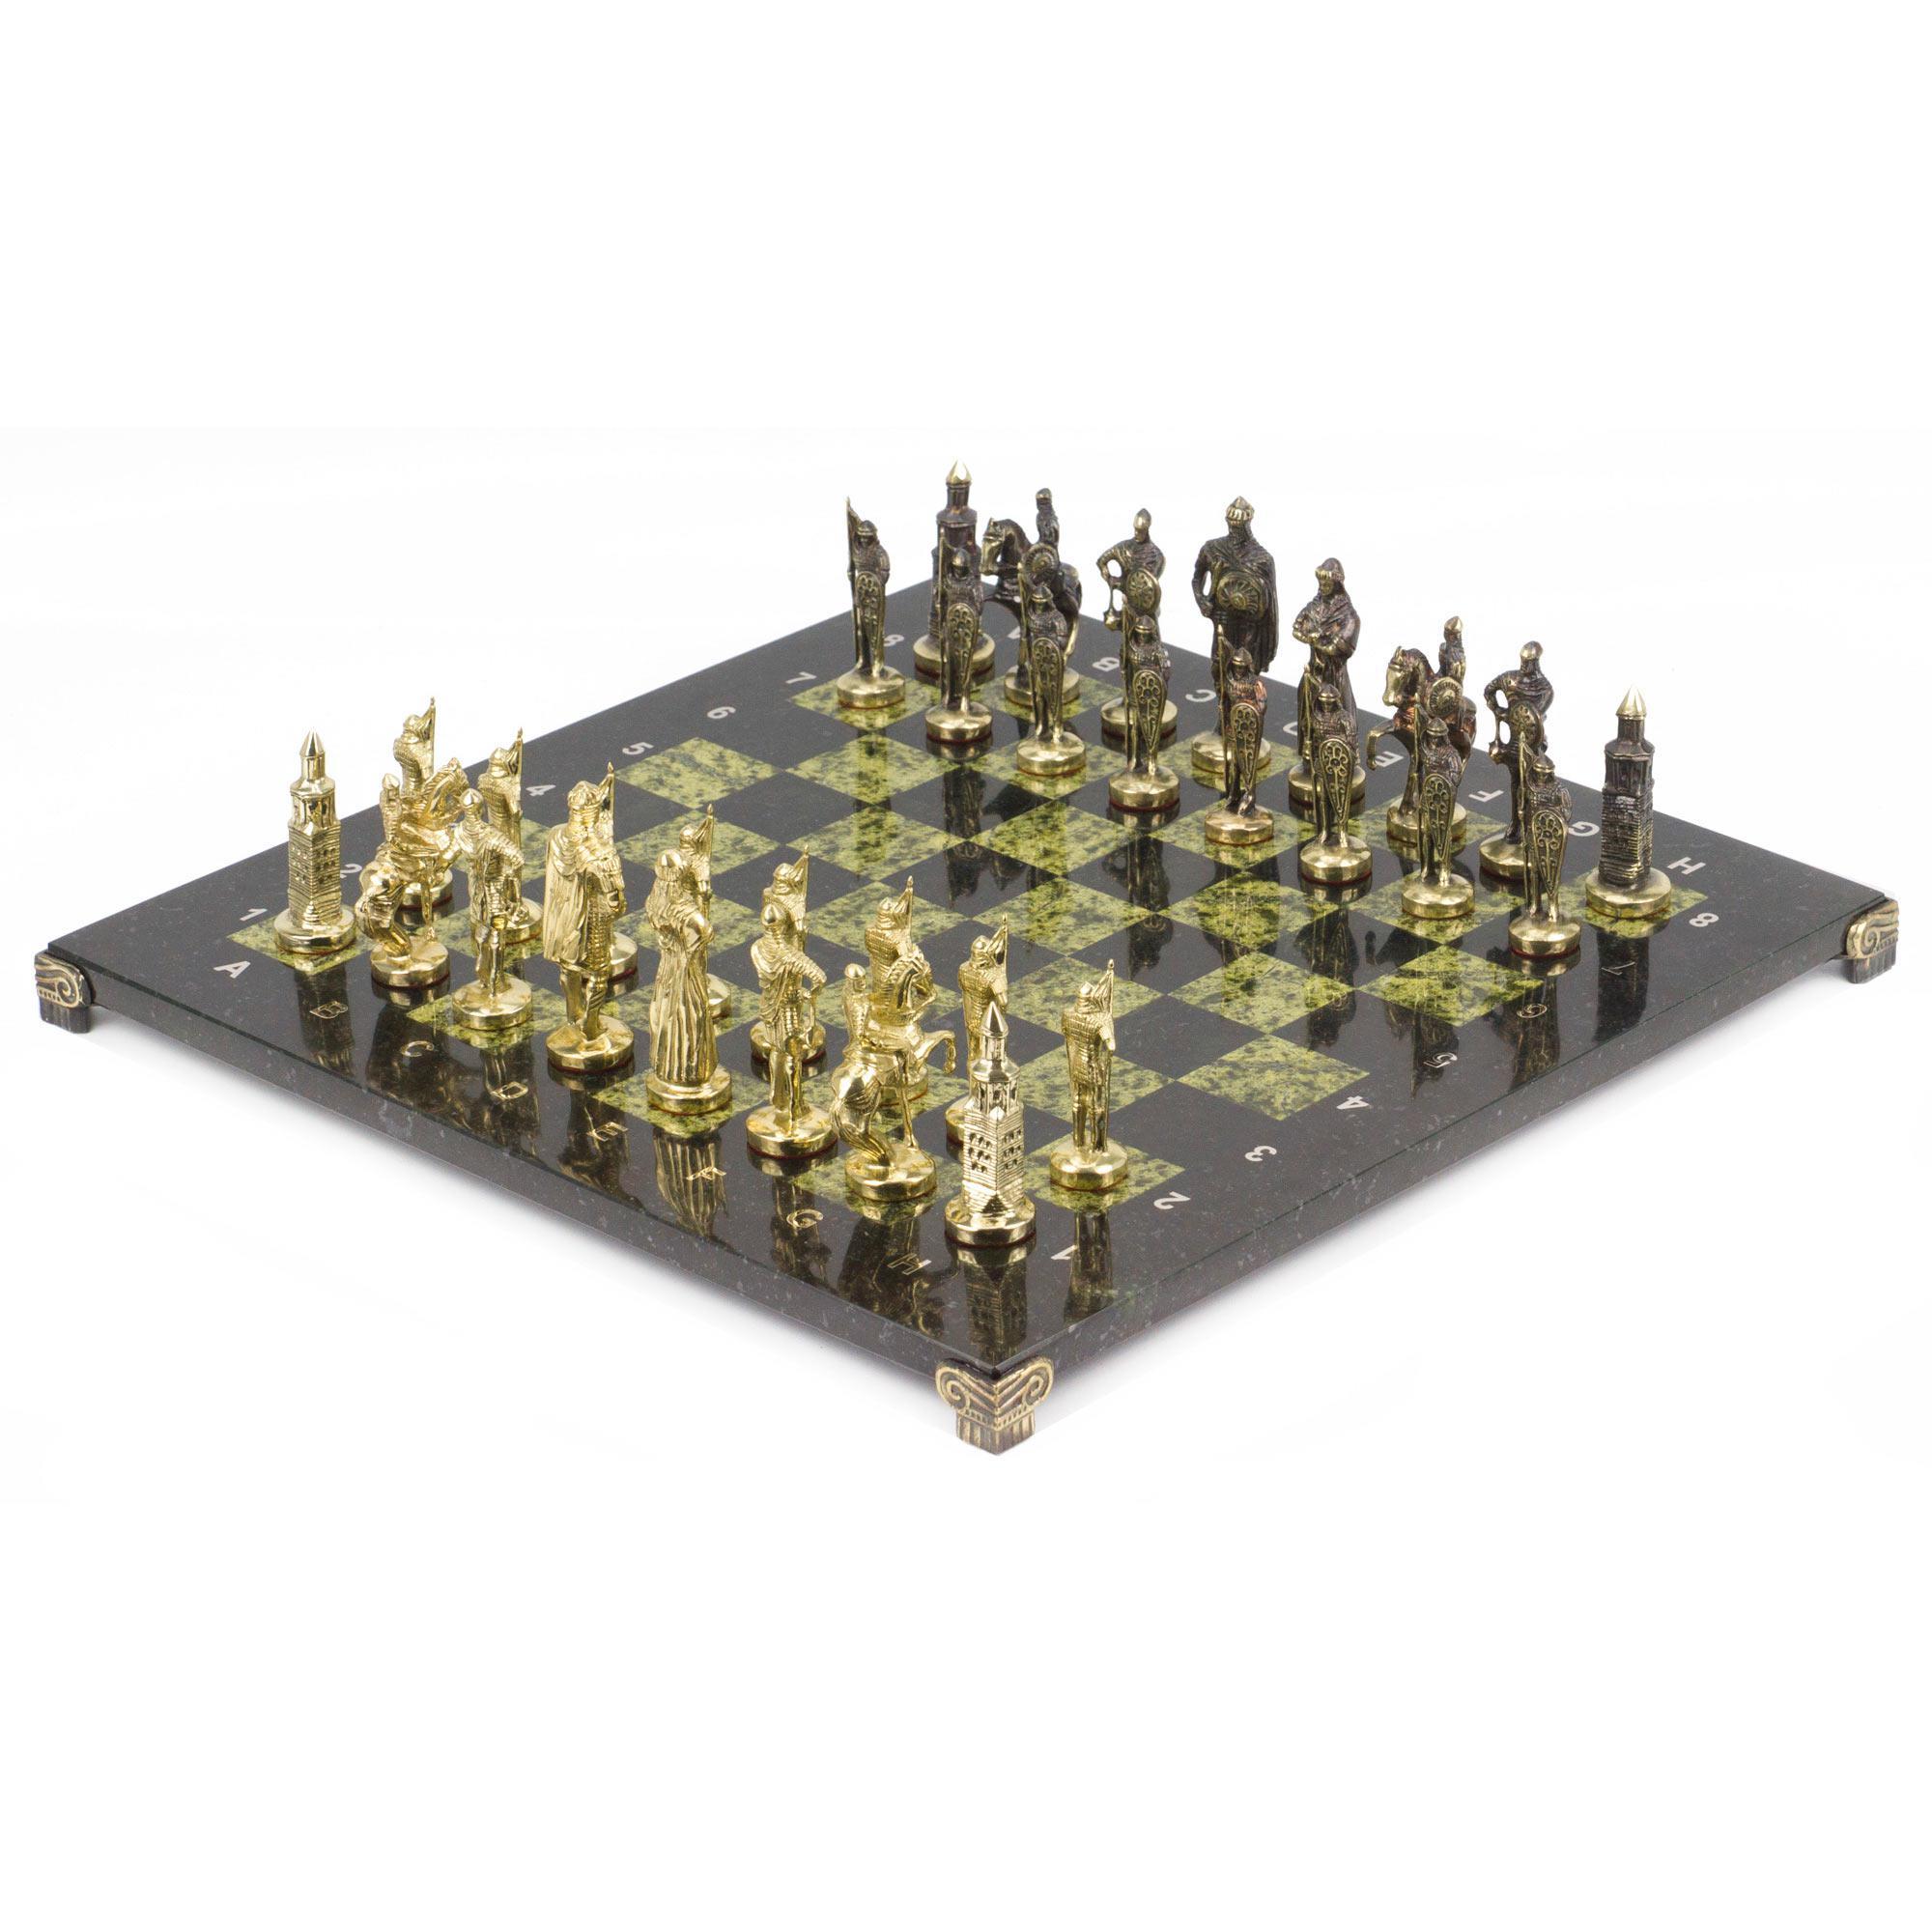 Шахматы Русские фигуры из бронзы, доска змеевика 40х40см